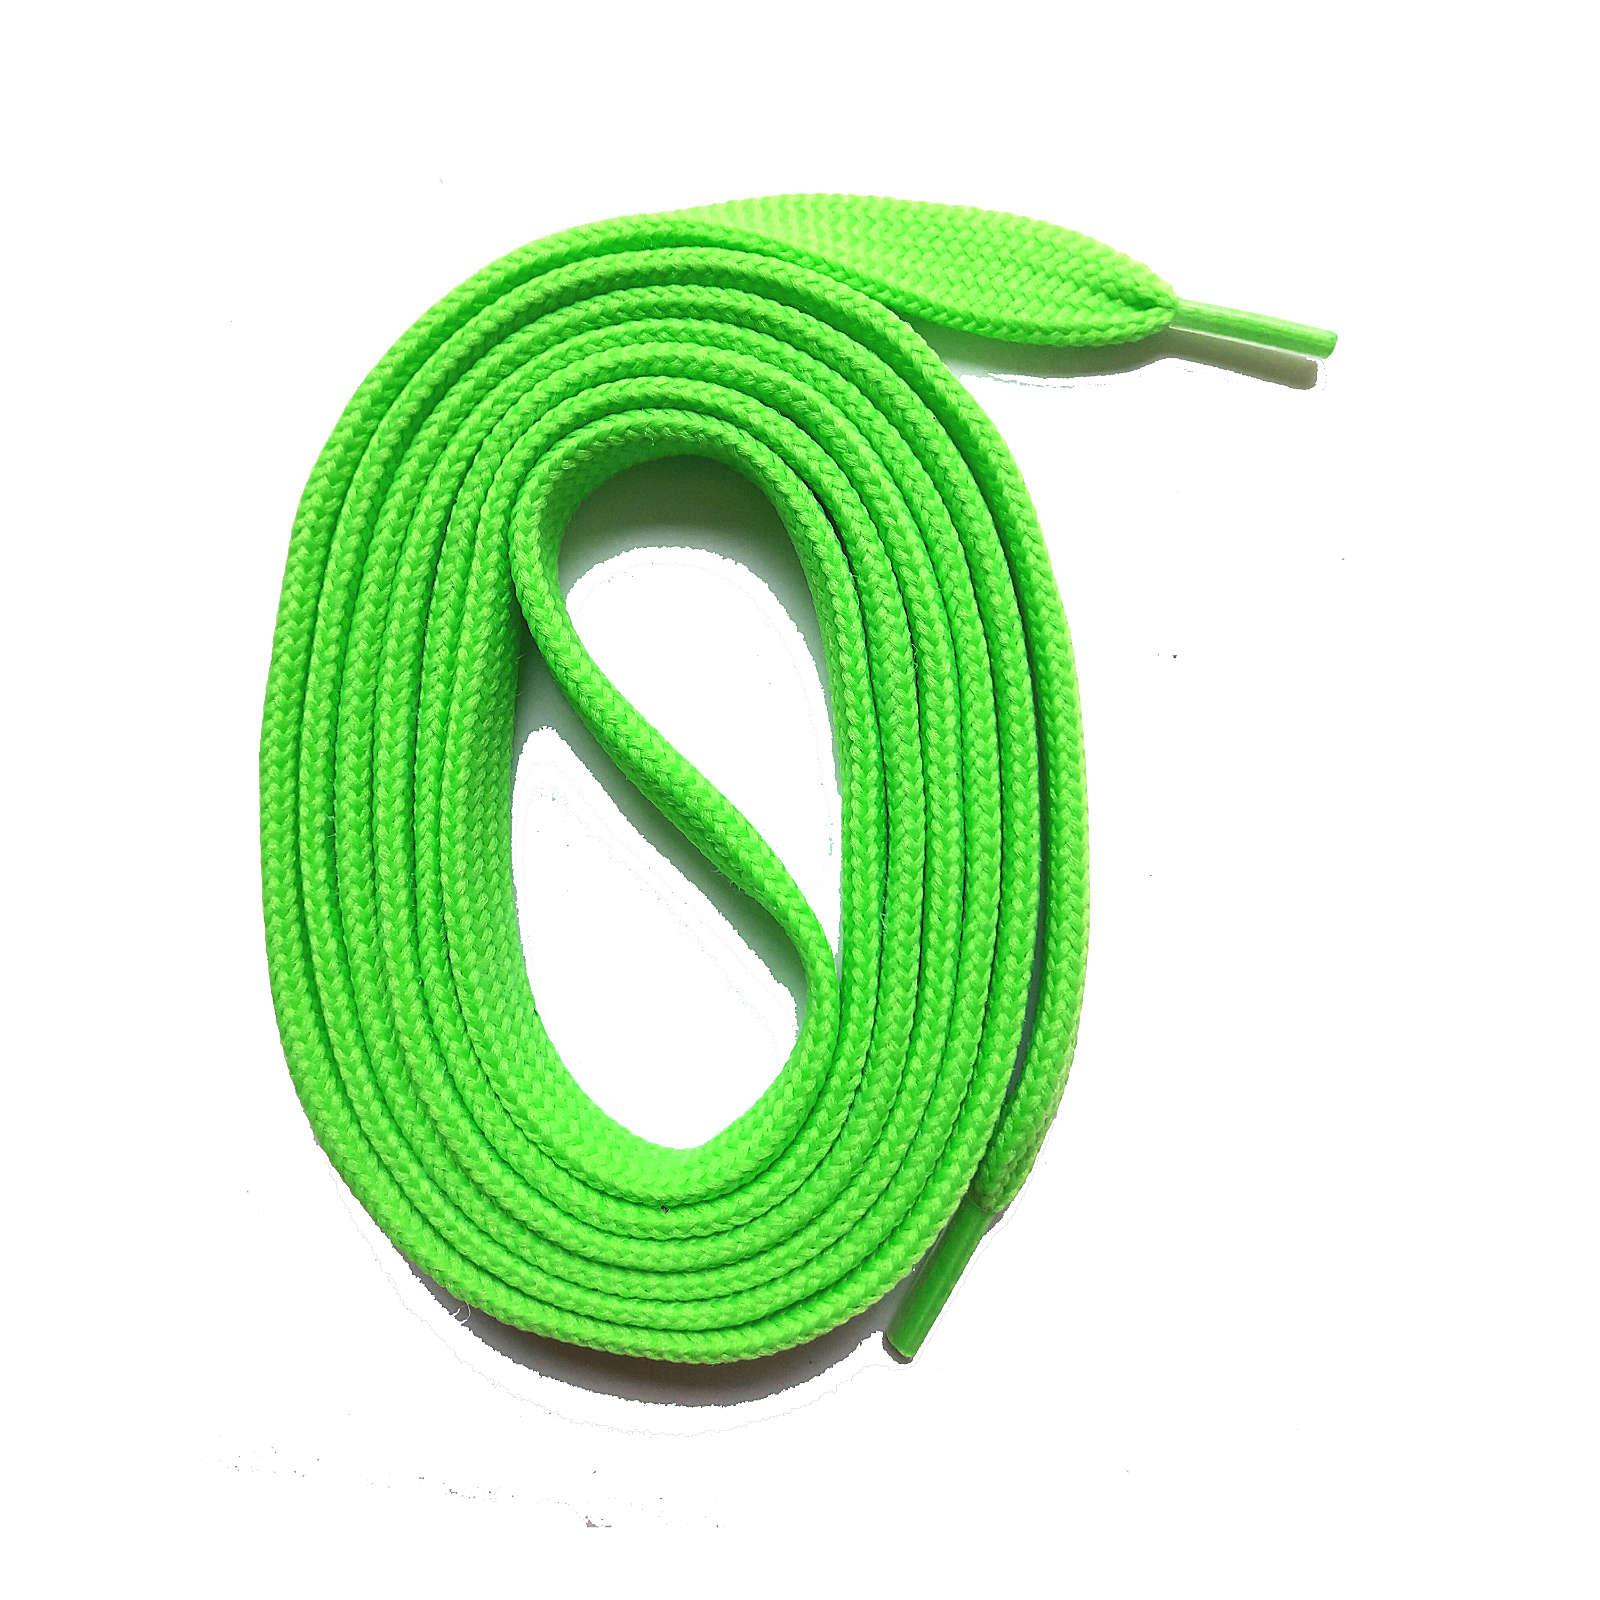 SNORS shoefriends SNORS Schnürsenkel flach 60-240cm, 7mm aus Polyester Schnürsenkel neongrün Gr. 60